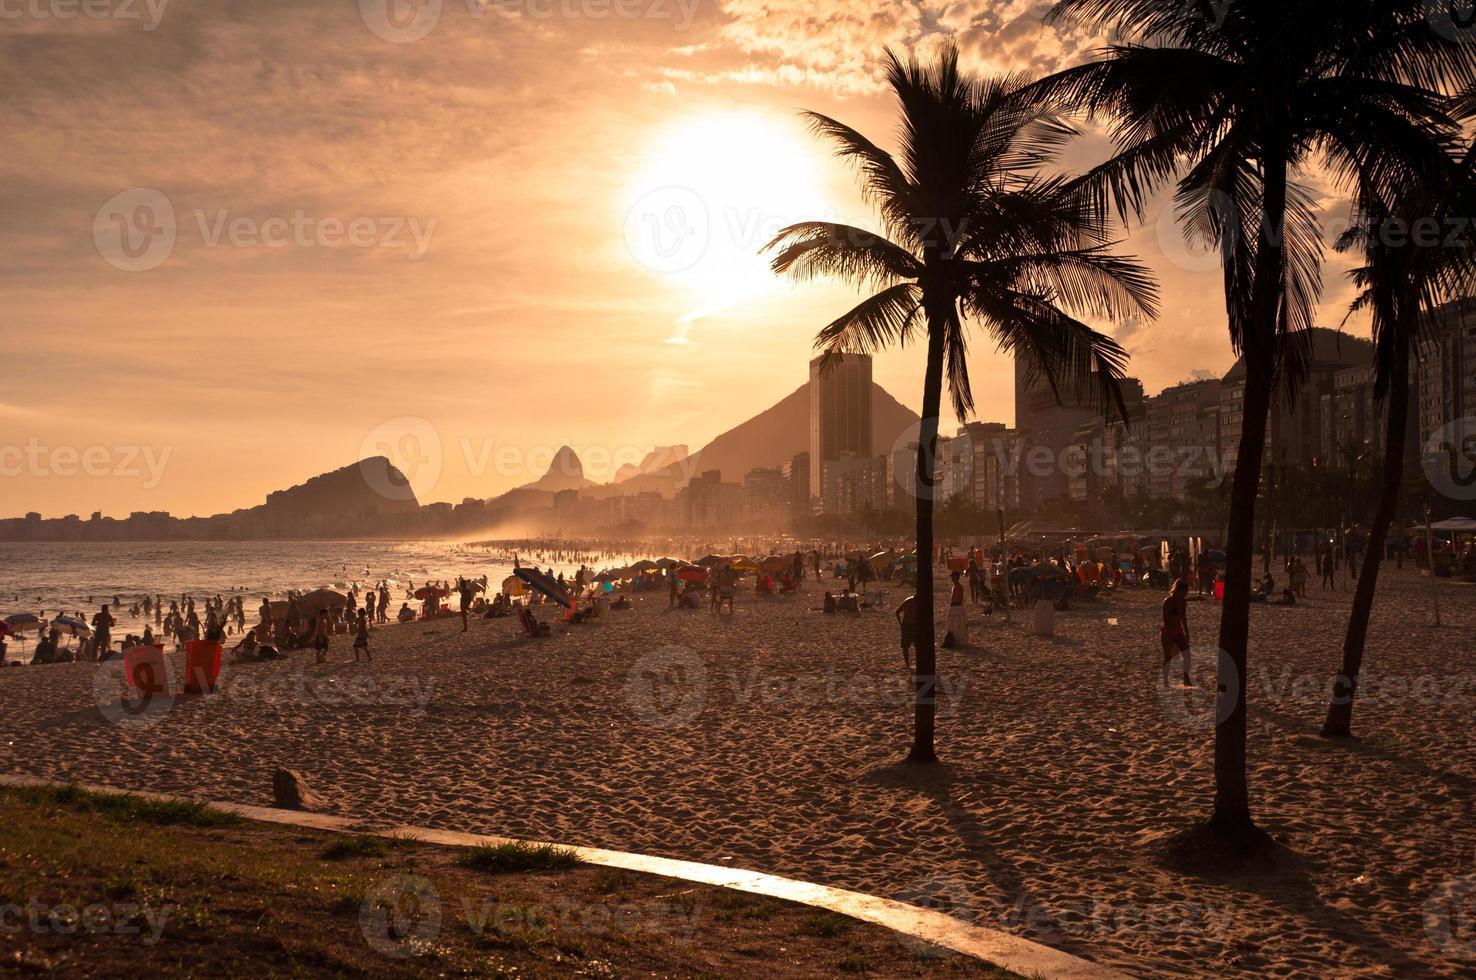 Copacabana Strand bei Sonnenuntergang foto